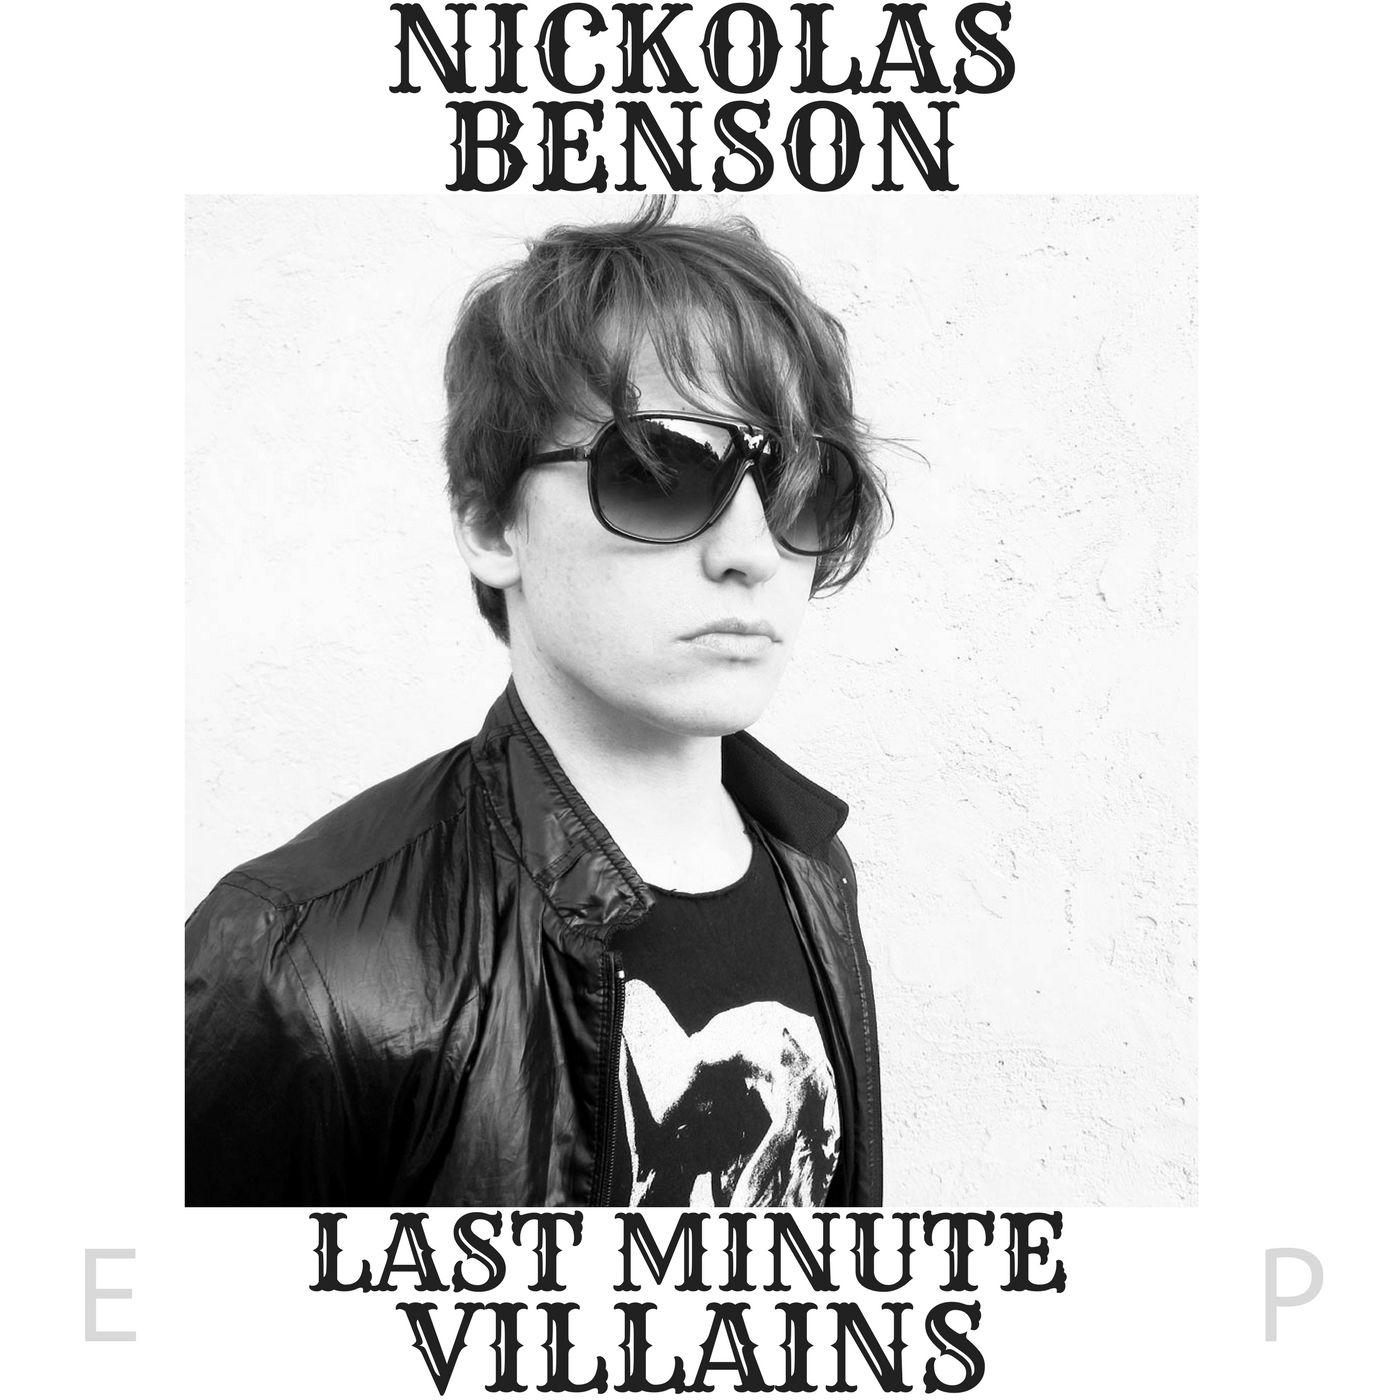 Nickolas Benson